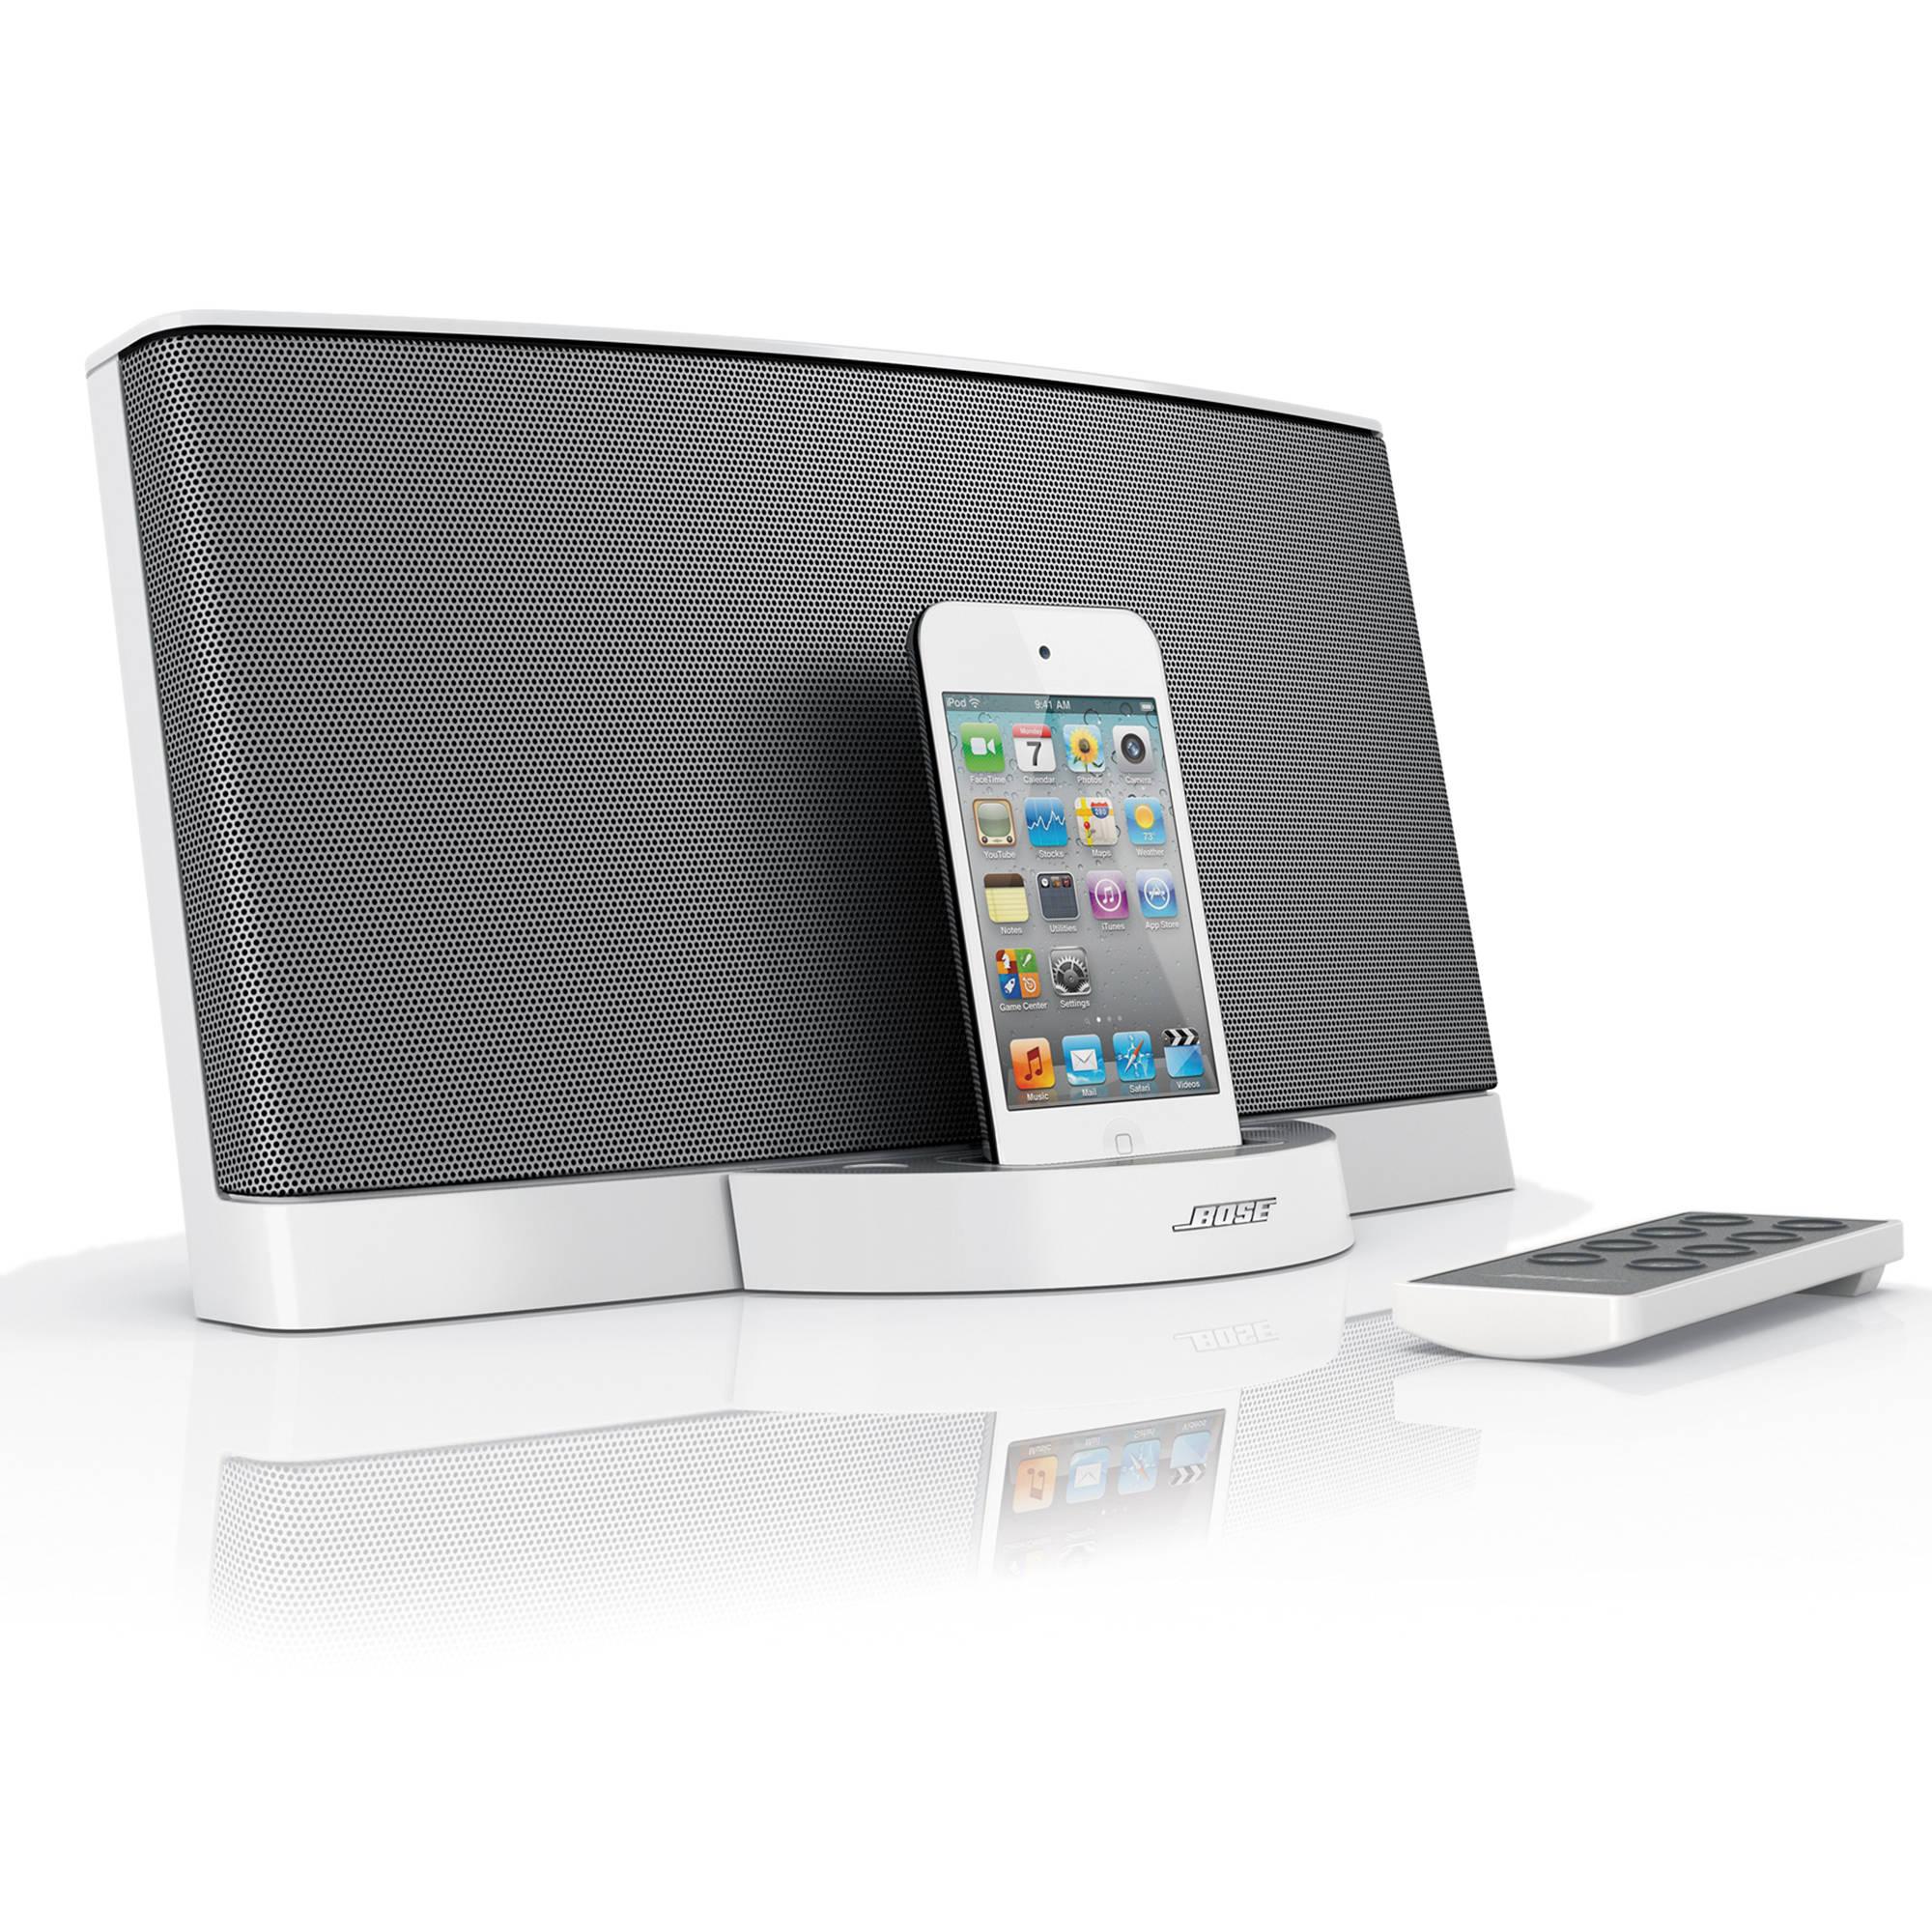 Bose SoundDock Series II Digital Music System (White) d9da614abb3bd